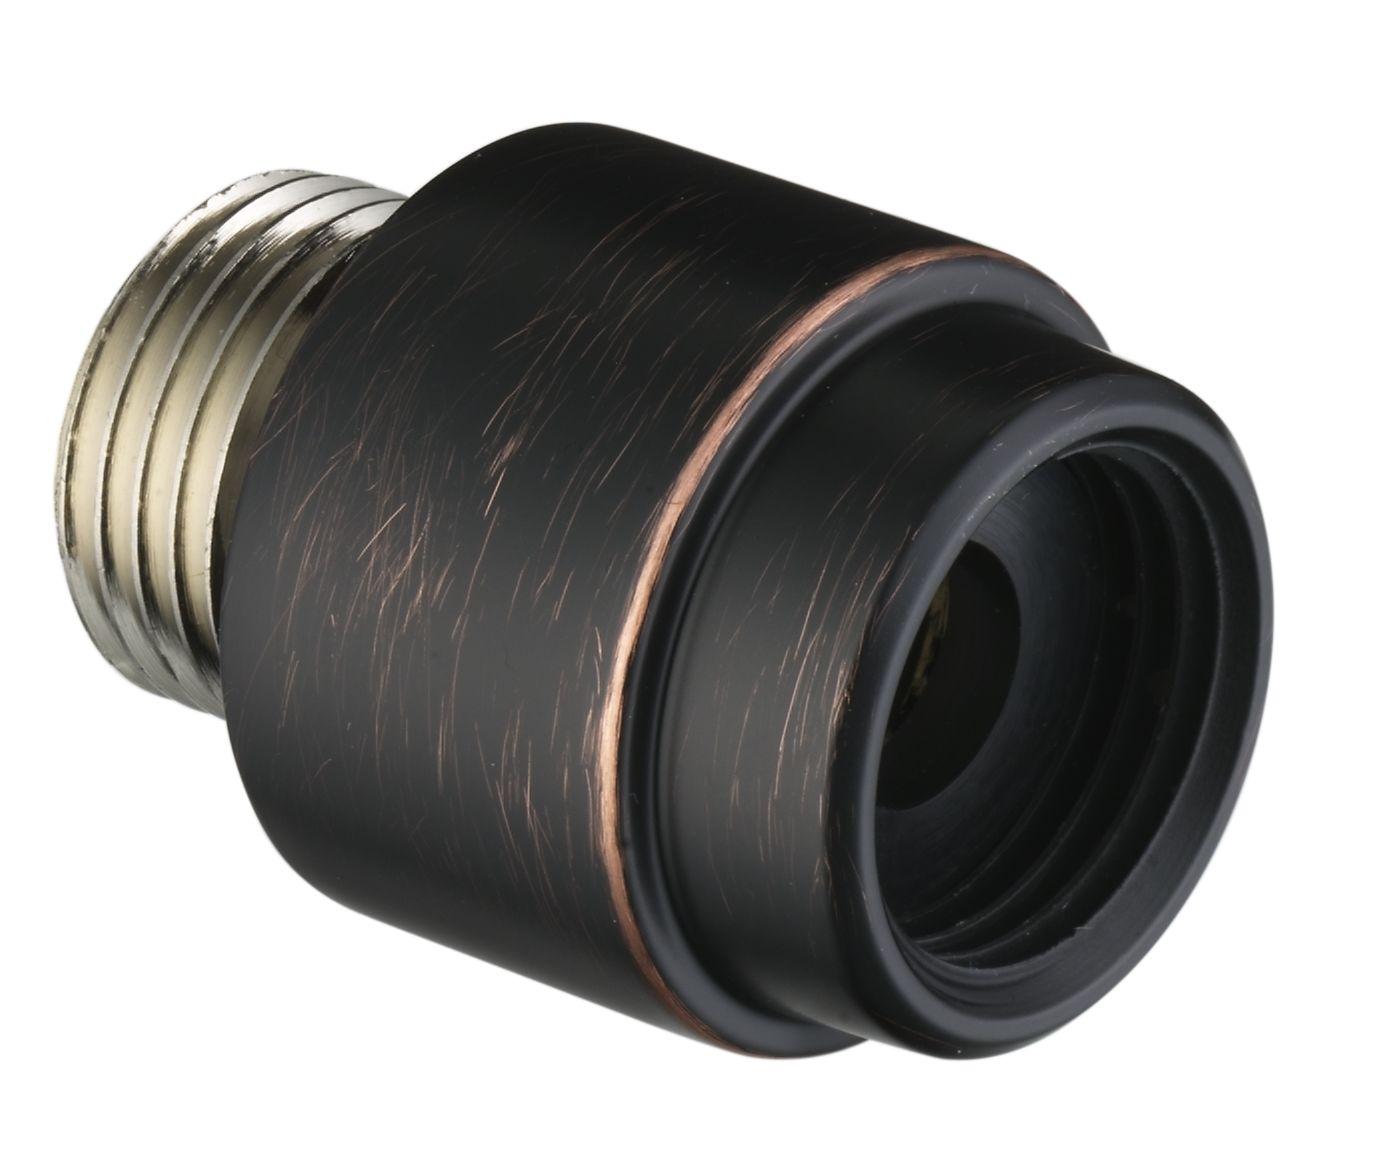 Hansgrohe 06510000 Chrome ShowerPower Vacuum Breaker External for ...